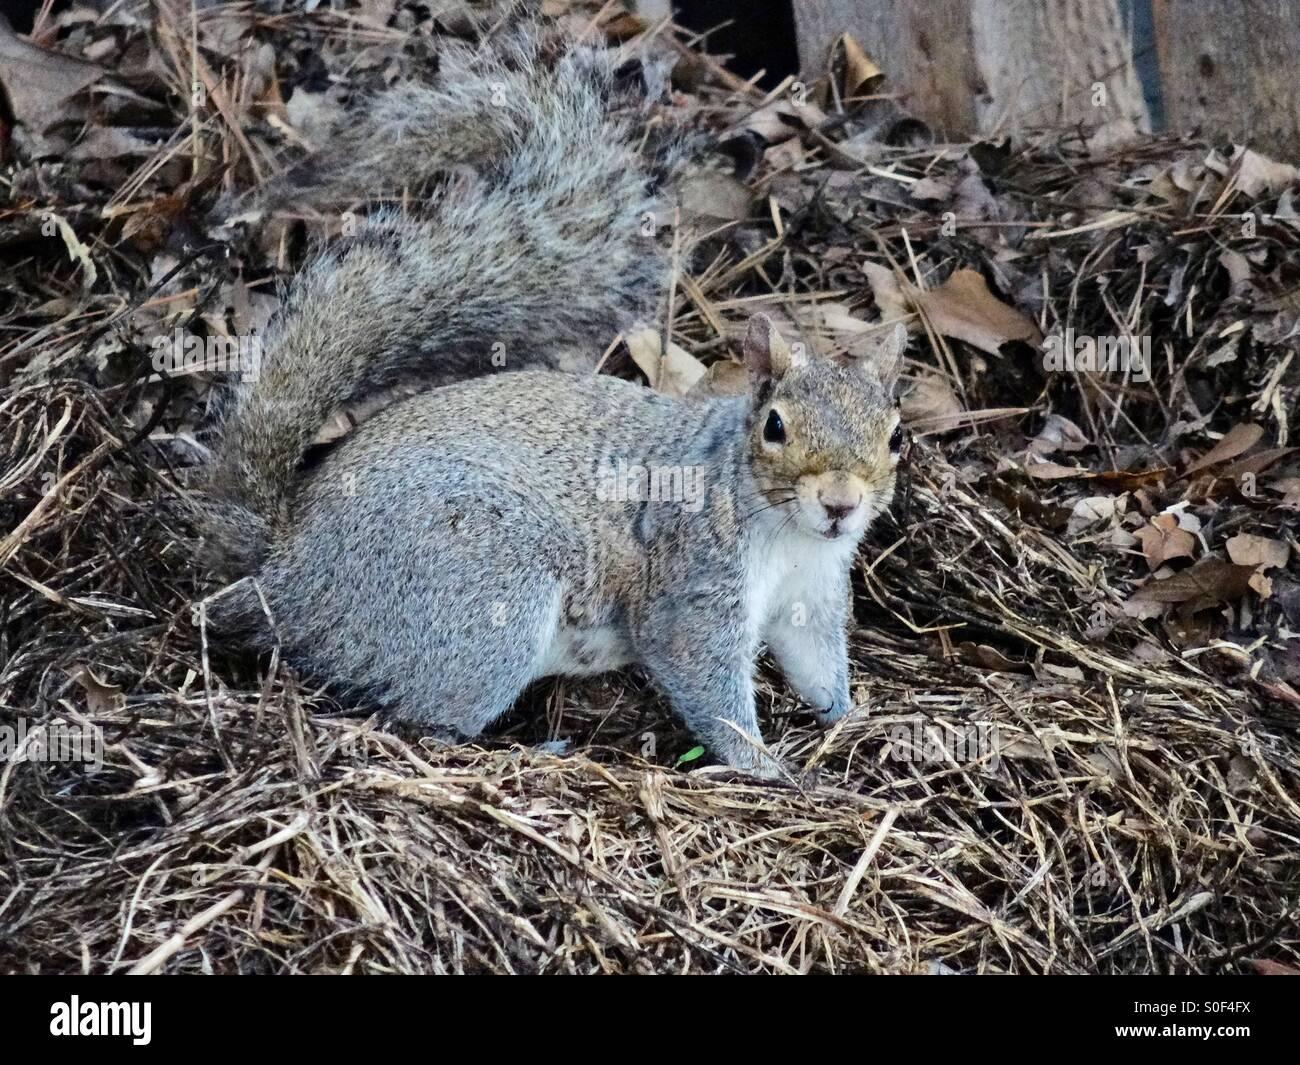 Squirrel lies in nest - Stock Image